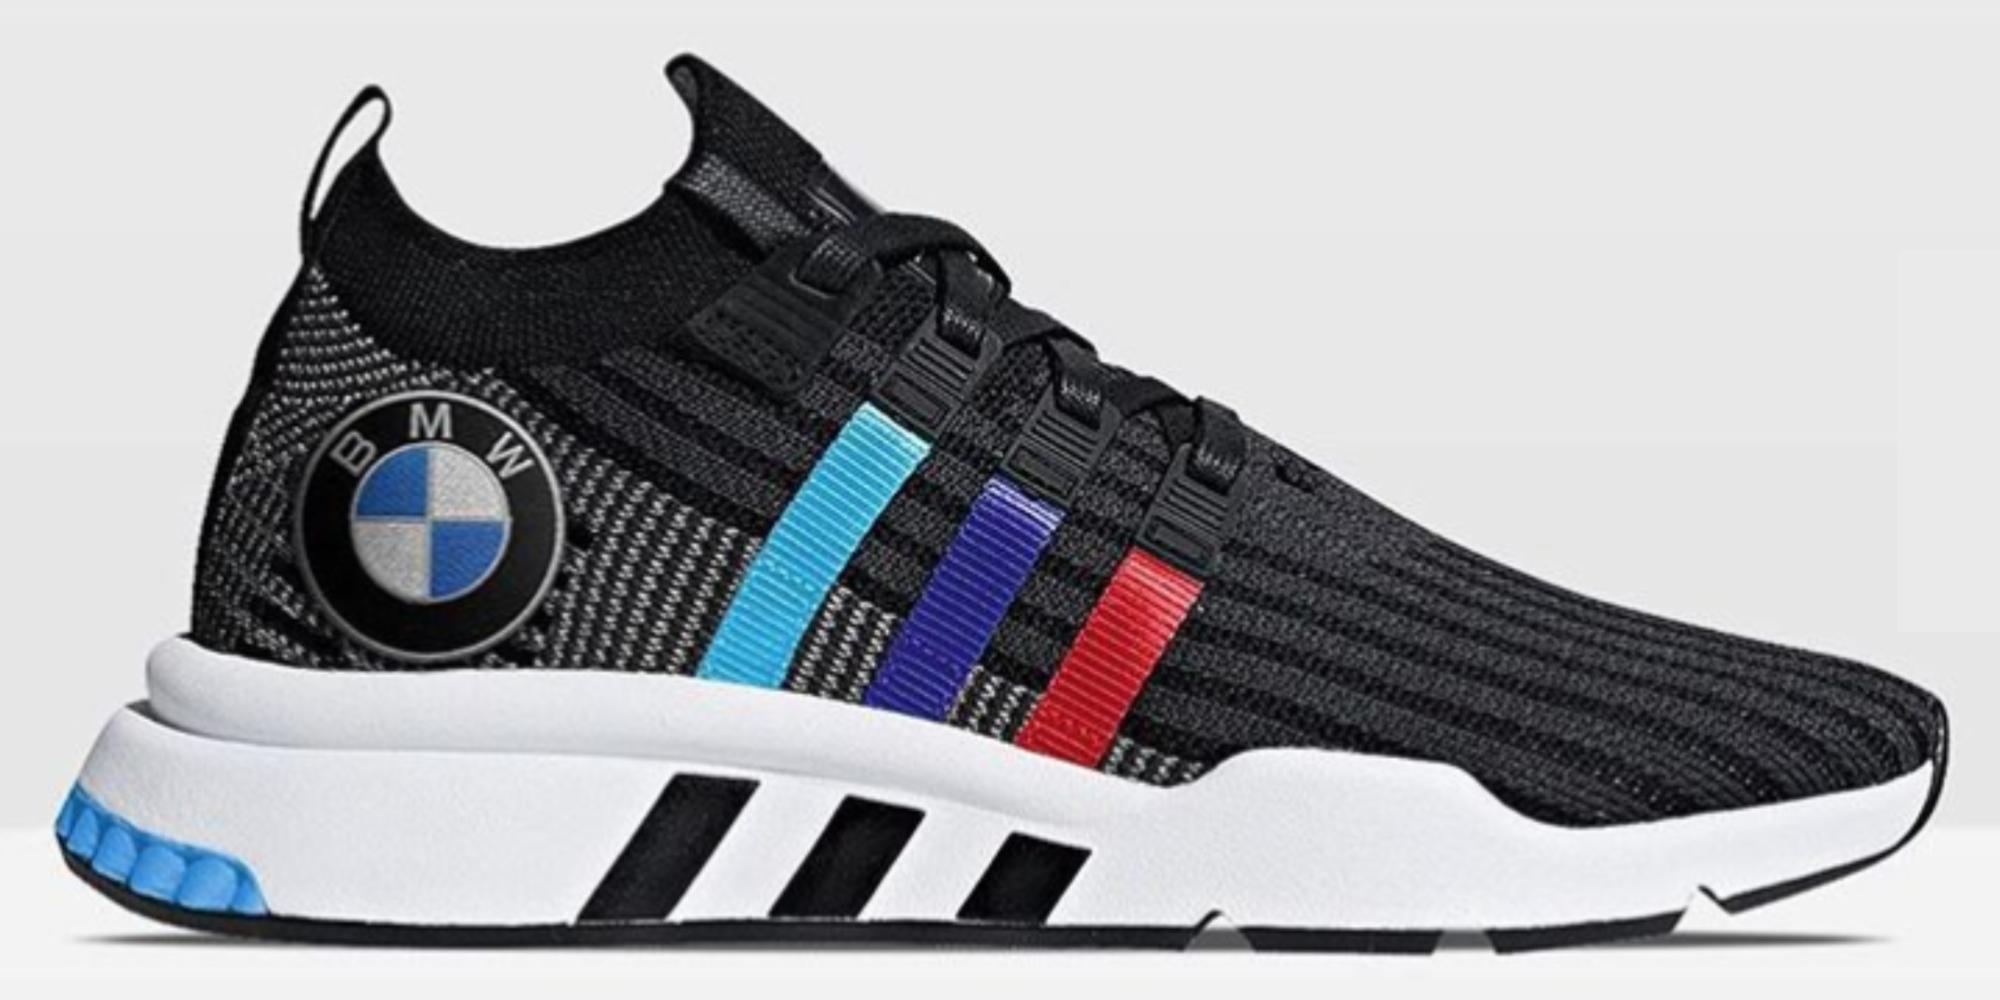 bmw x adidas eqt cheap online